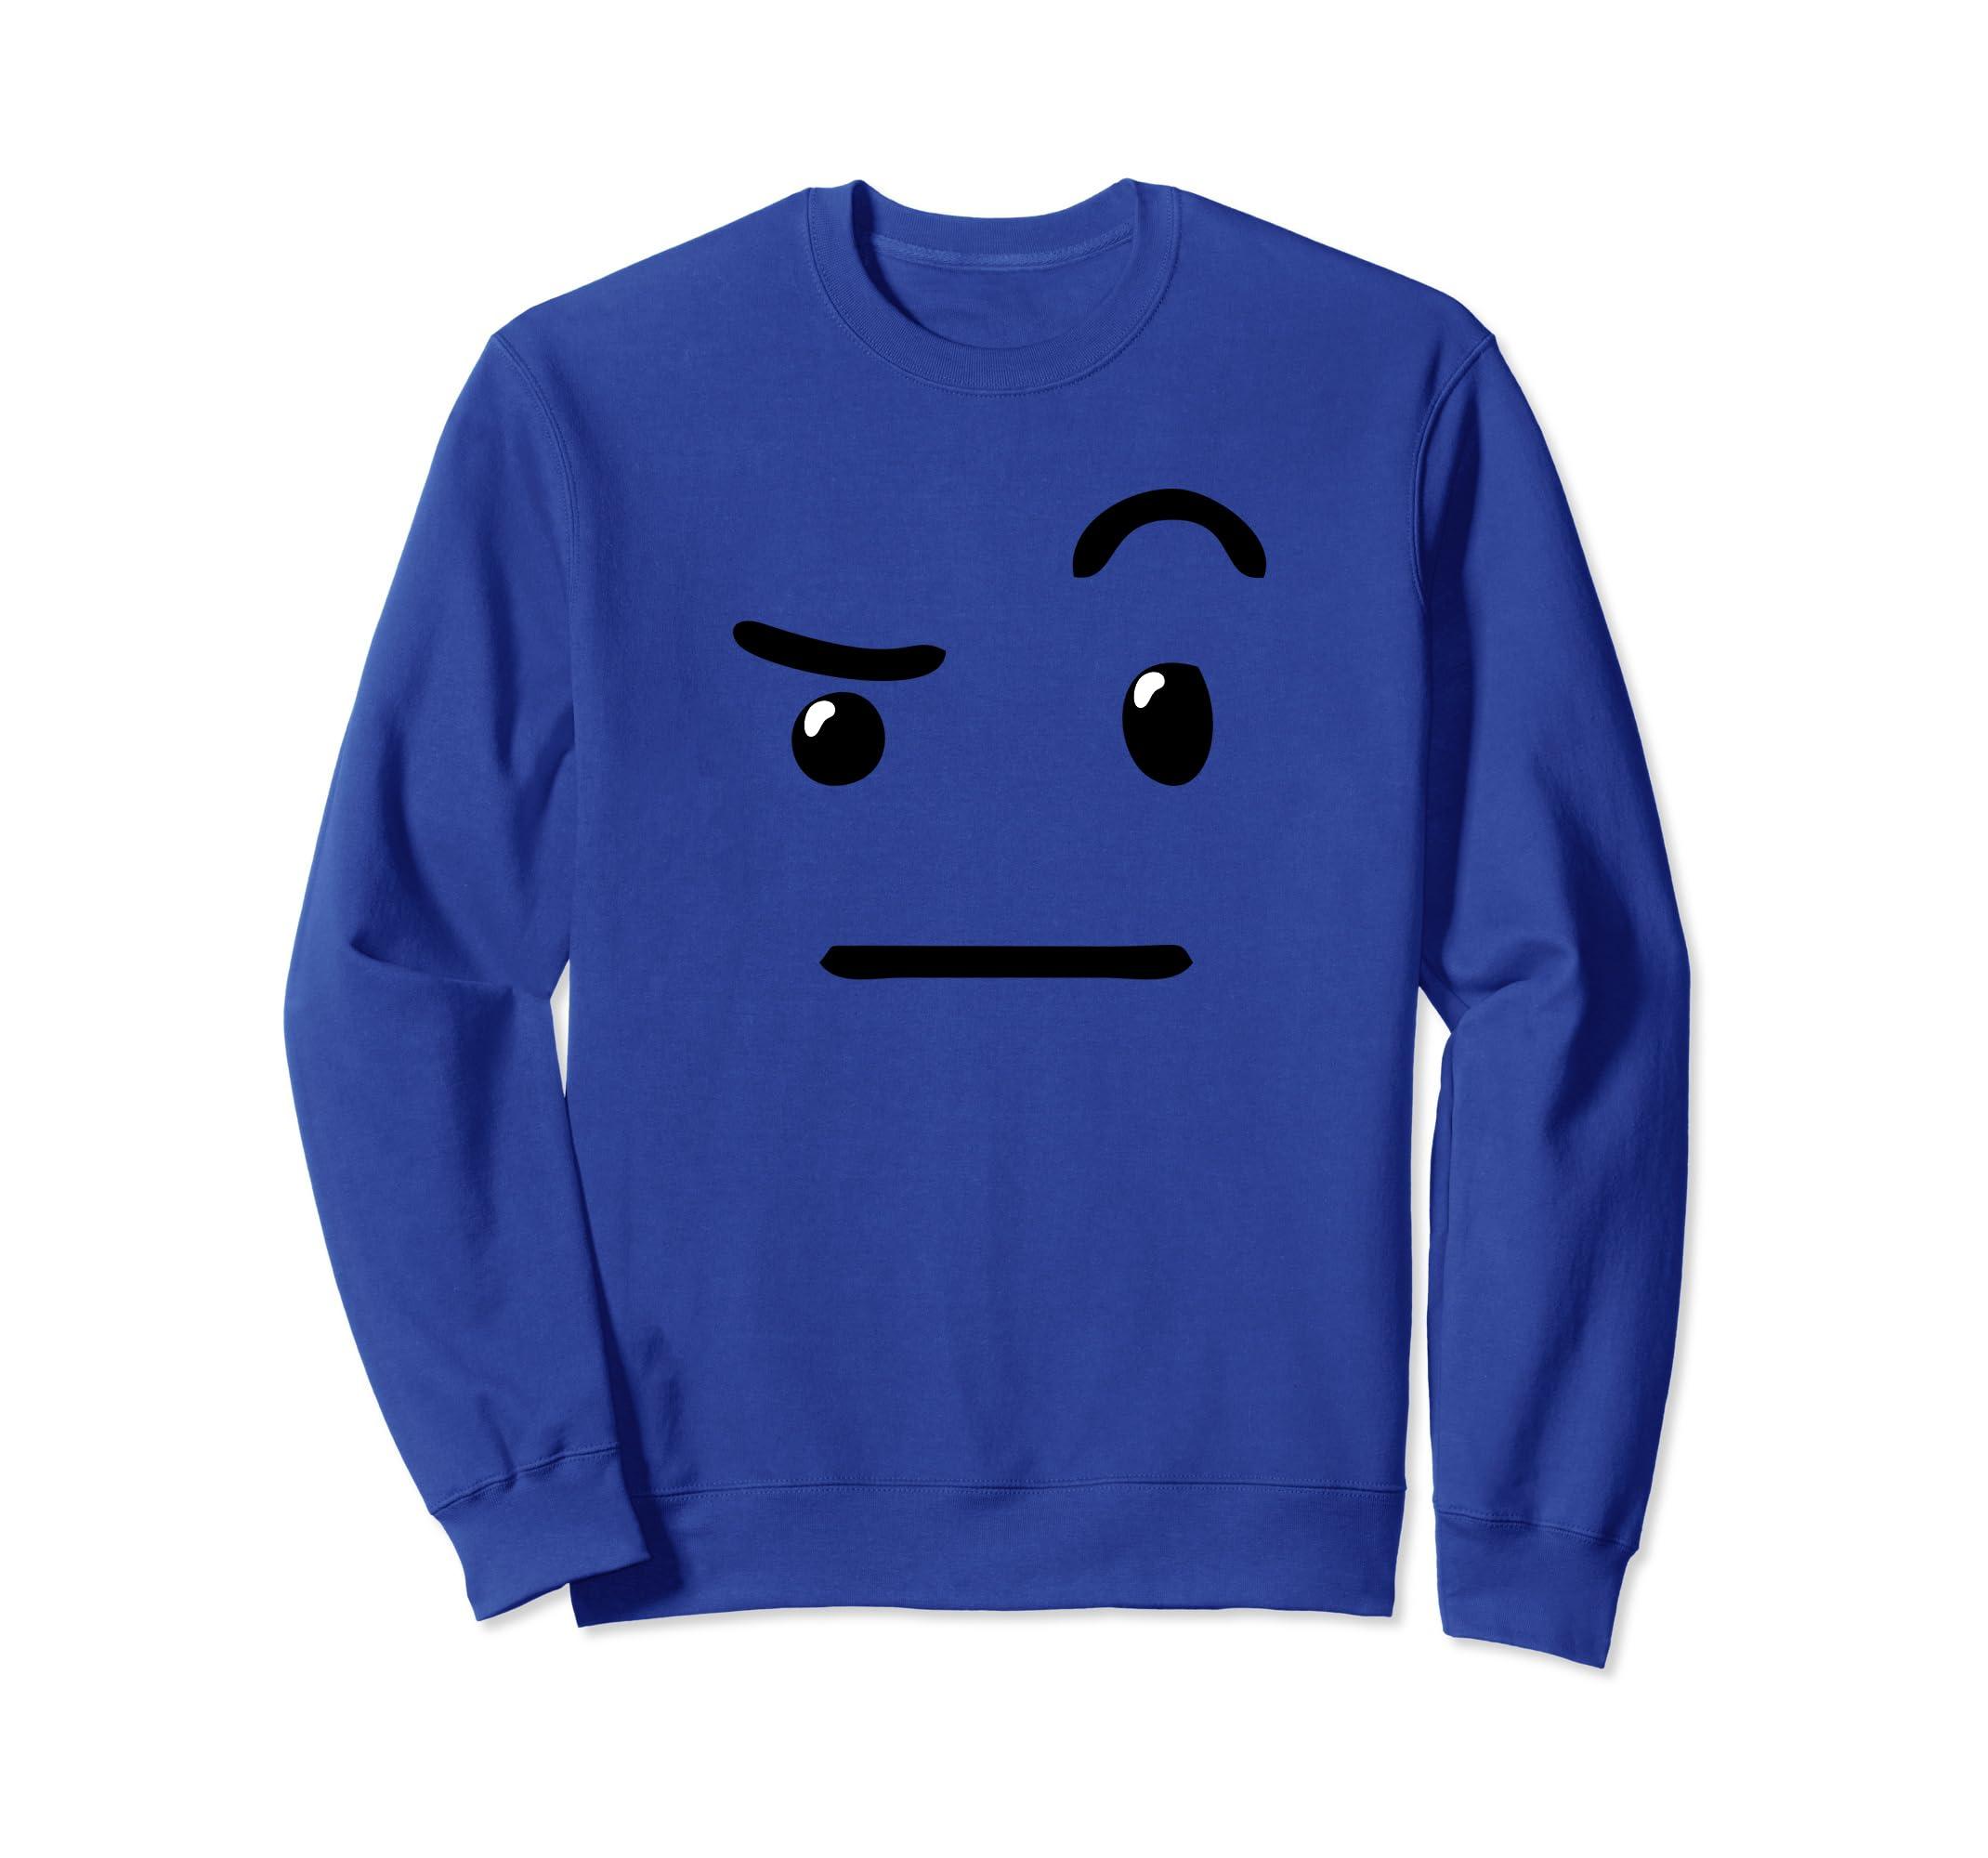 Amazon Raised Eyebrow Unsure Emojis Costume Party Sweatshirt